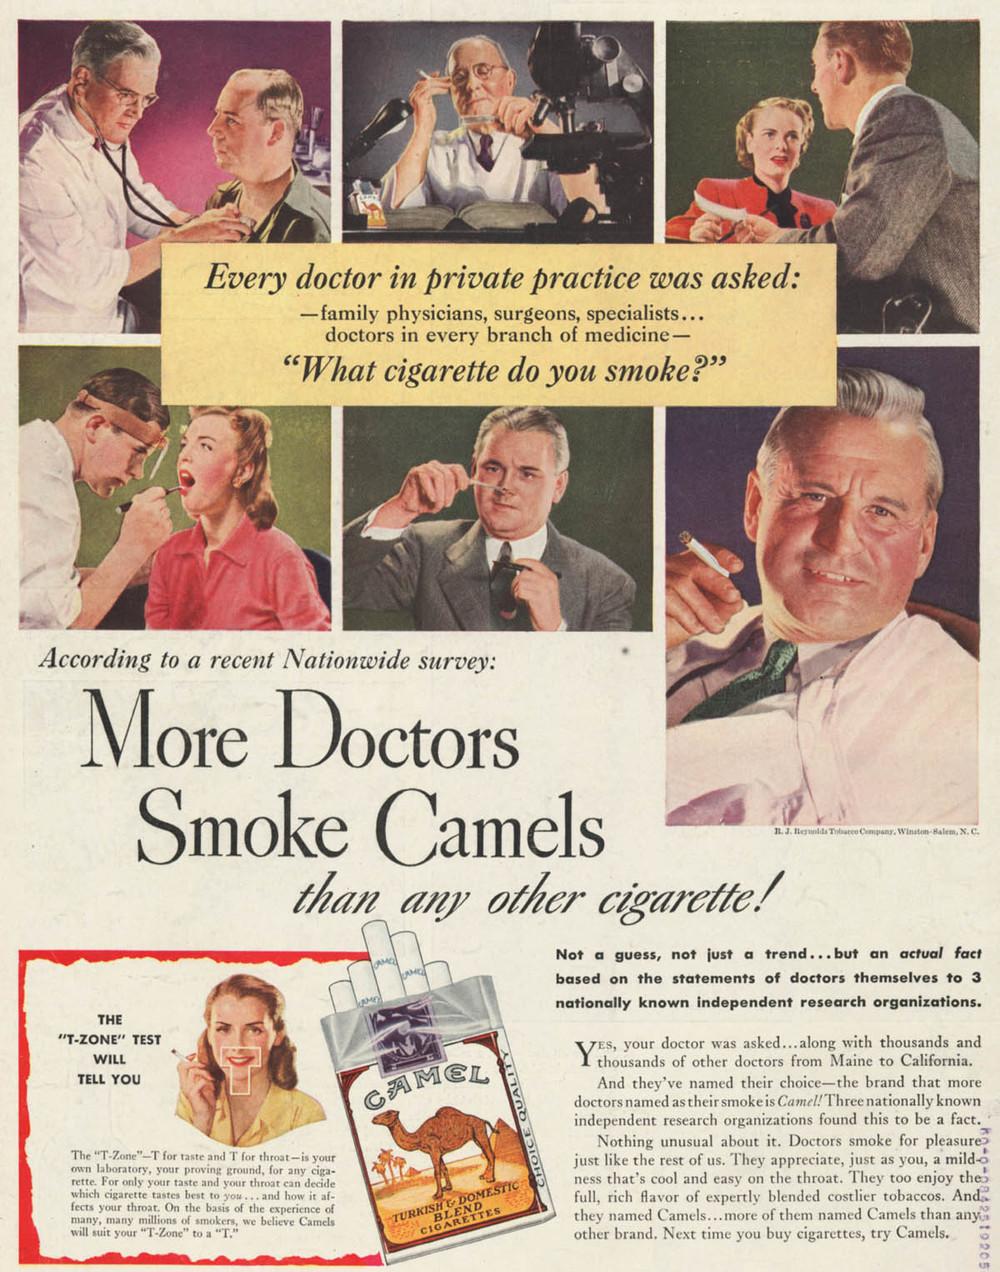 Source: tobacco.stanford.edu/